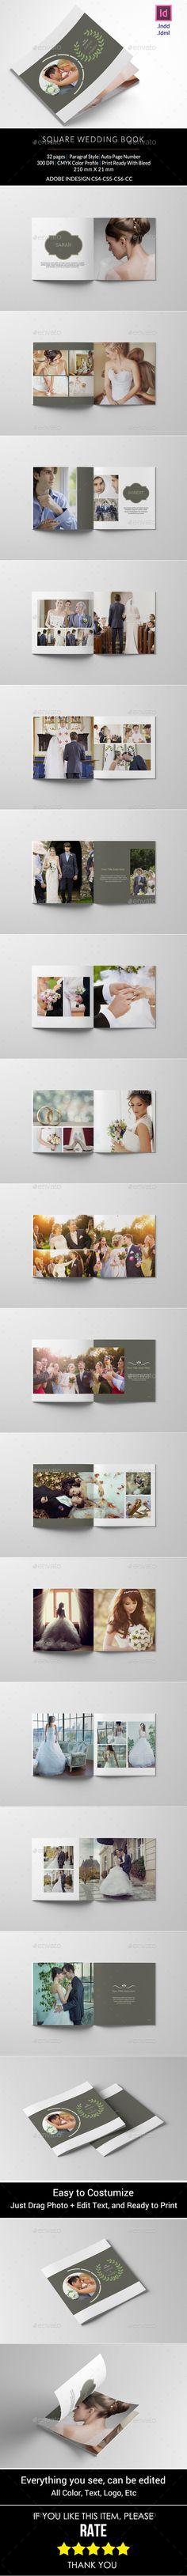 Square Wedding Photo Book Template